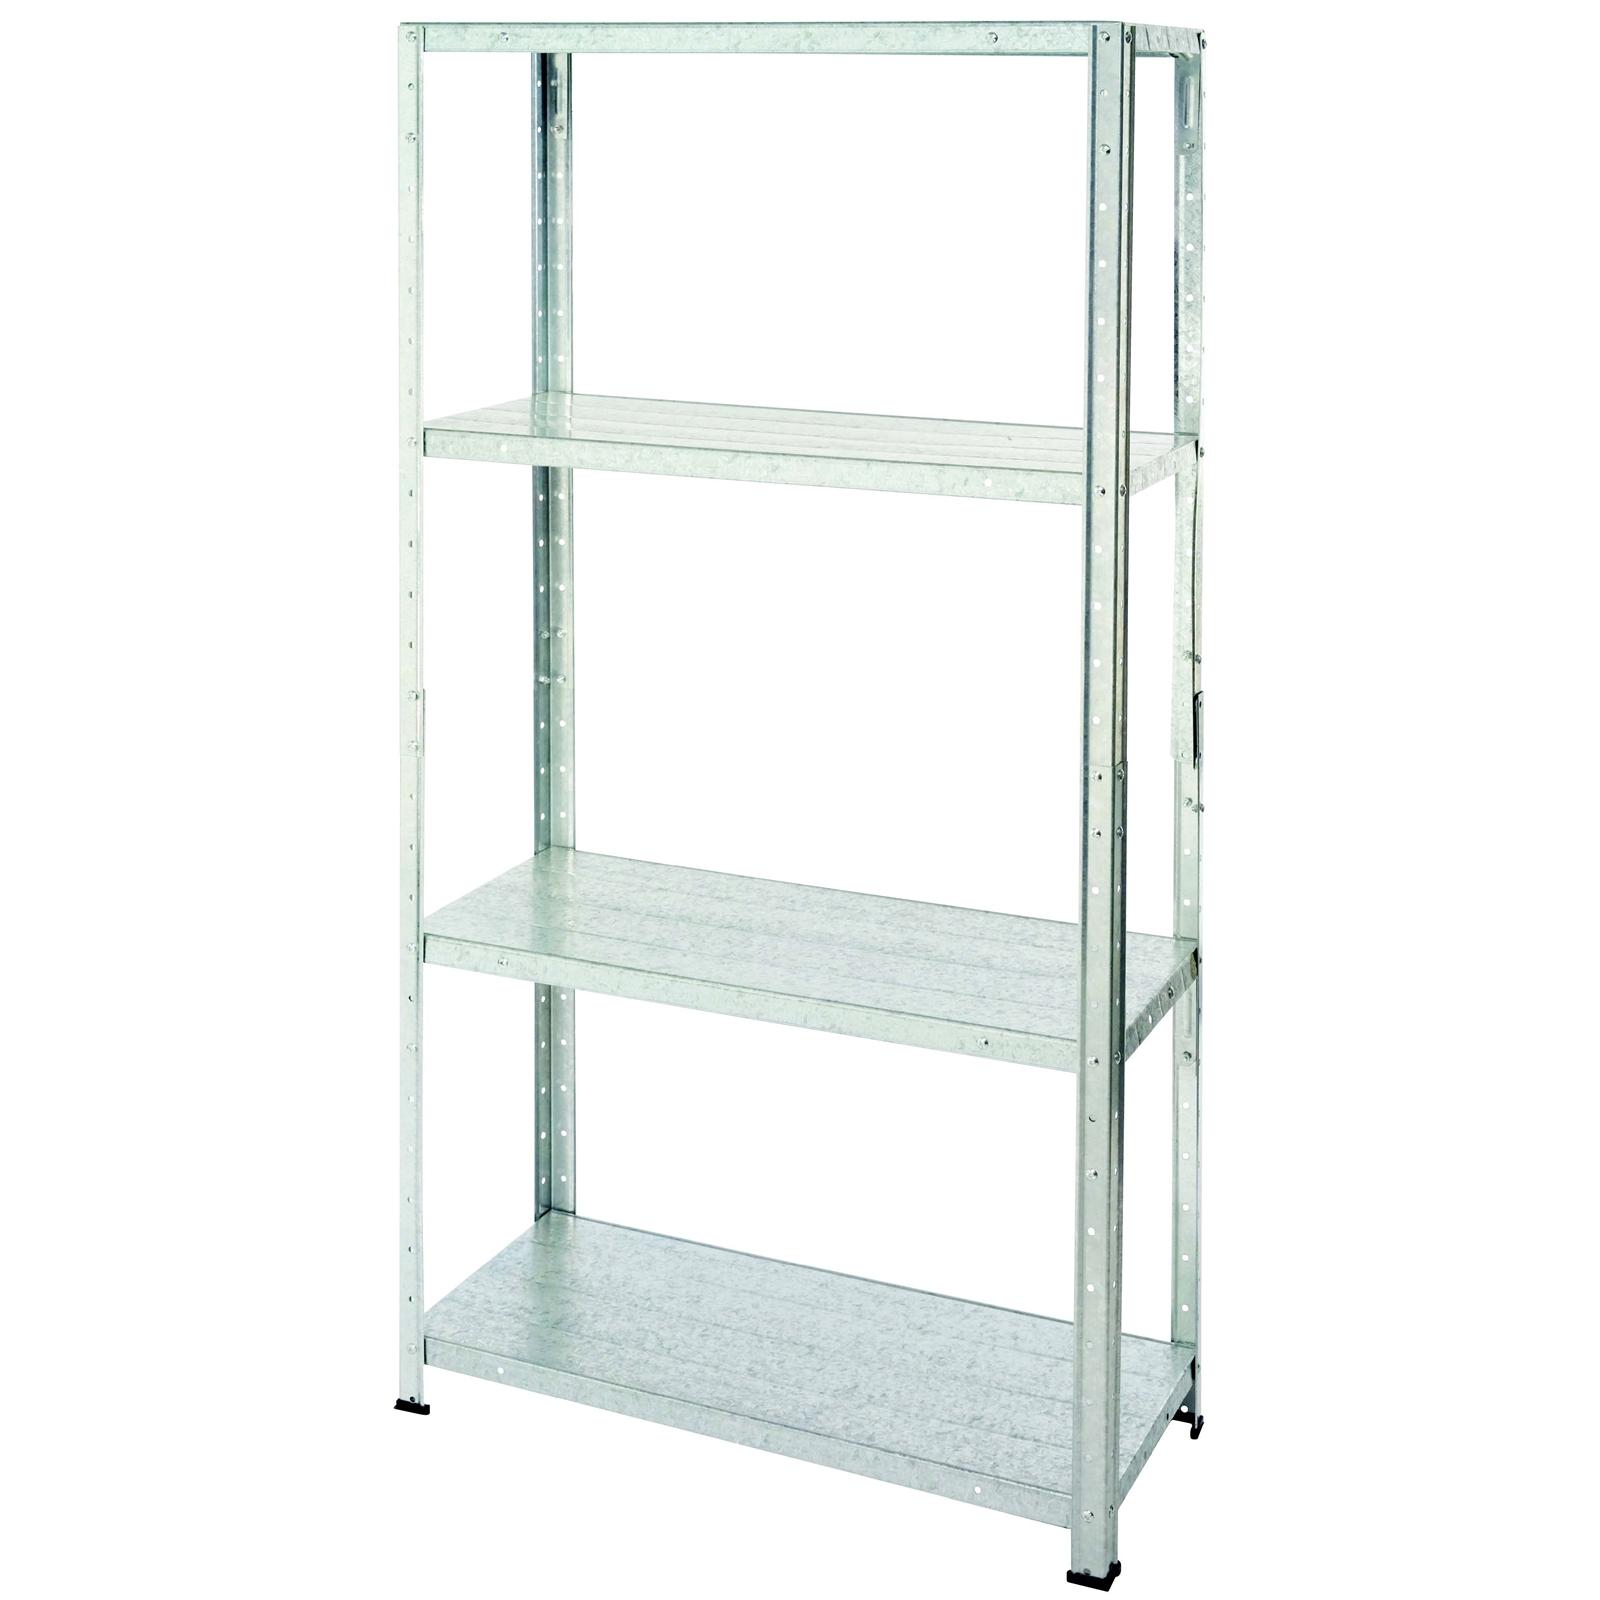 Galvanised Steel 4 Shelf Storage Unit (Max Weight capacity 200kg) - £10 @ Homebase